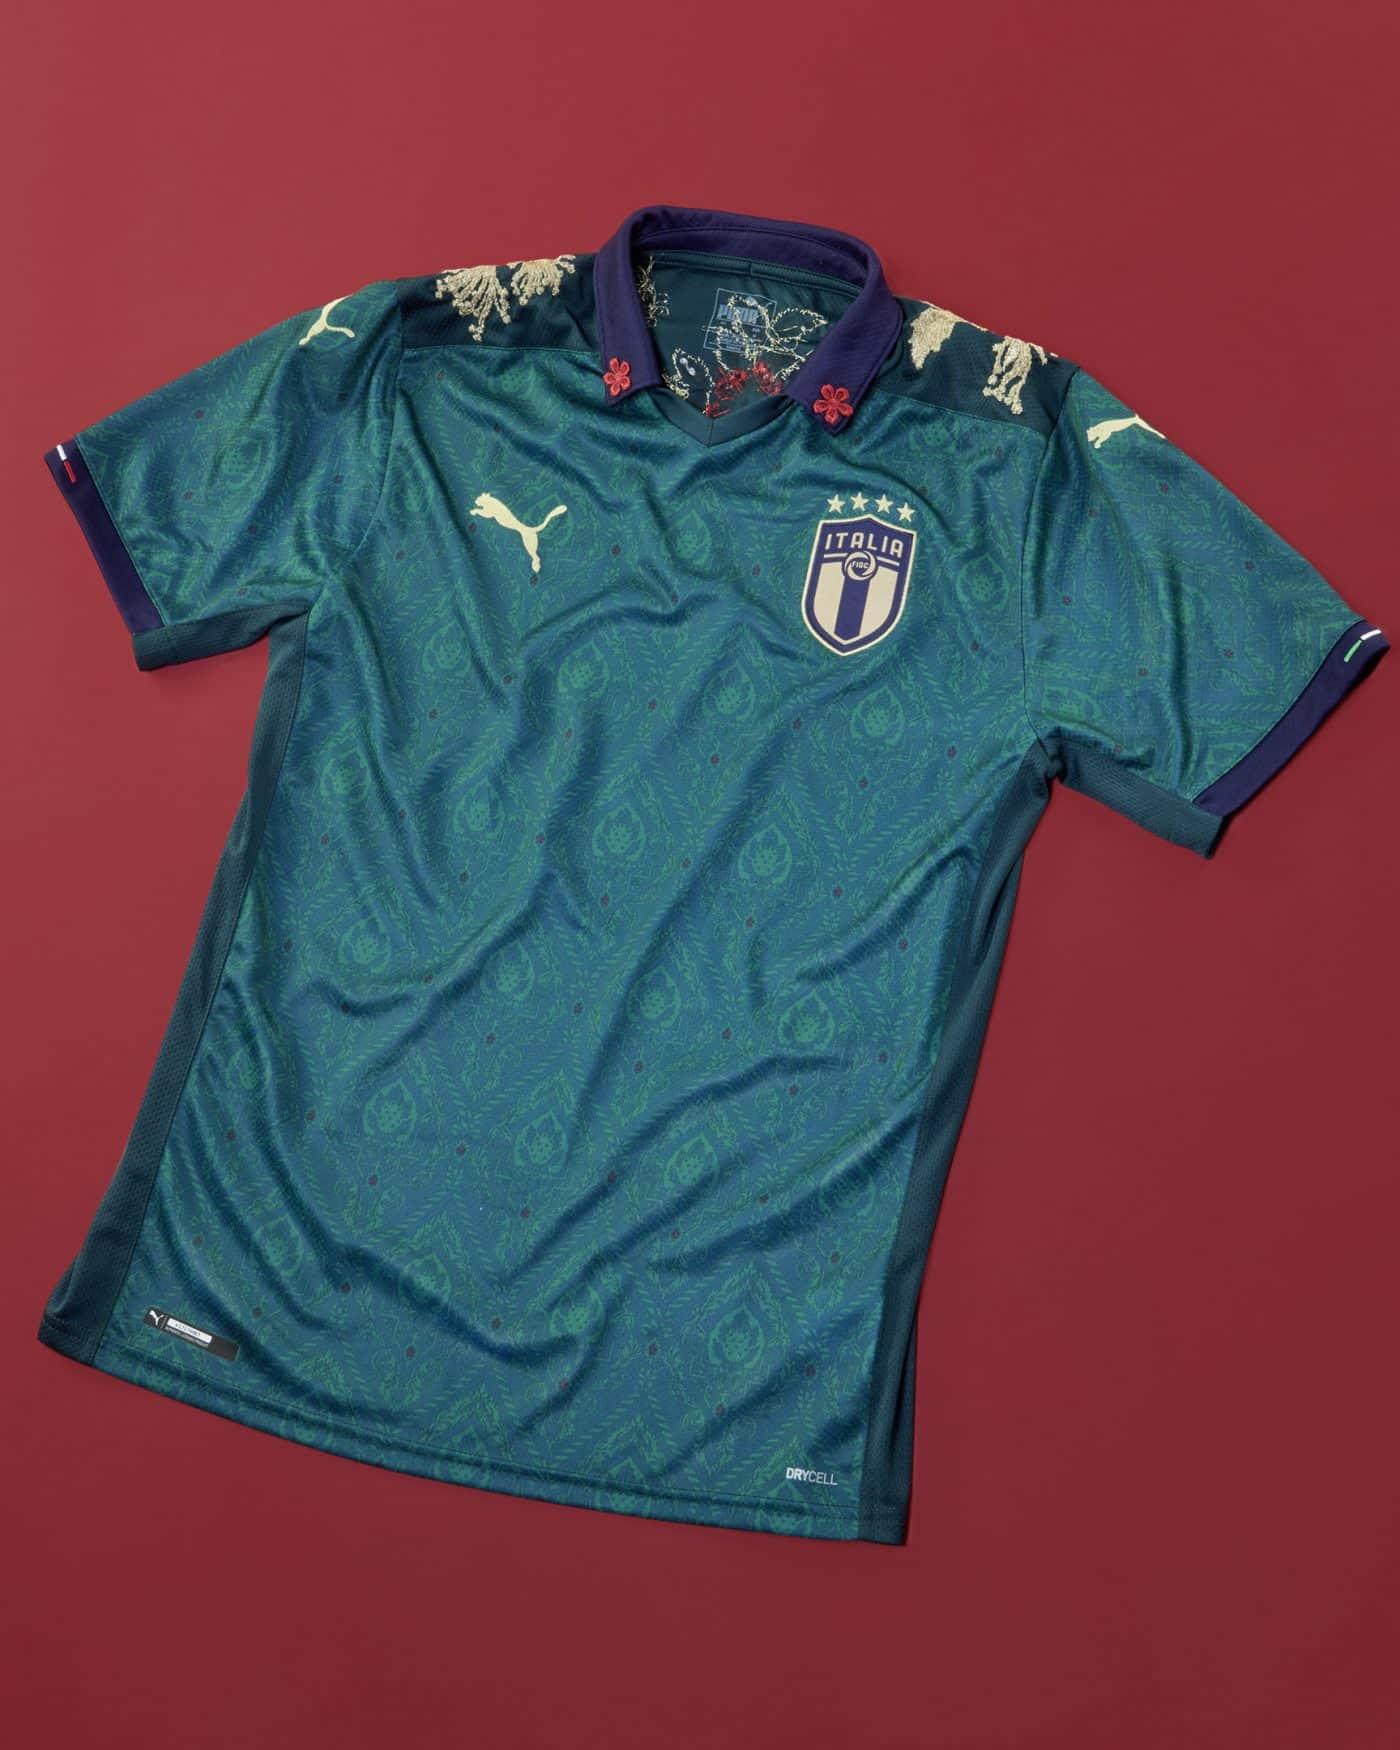 maillot-italie-renaissance-the-football-gall-4